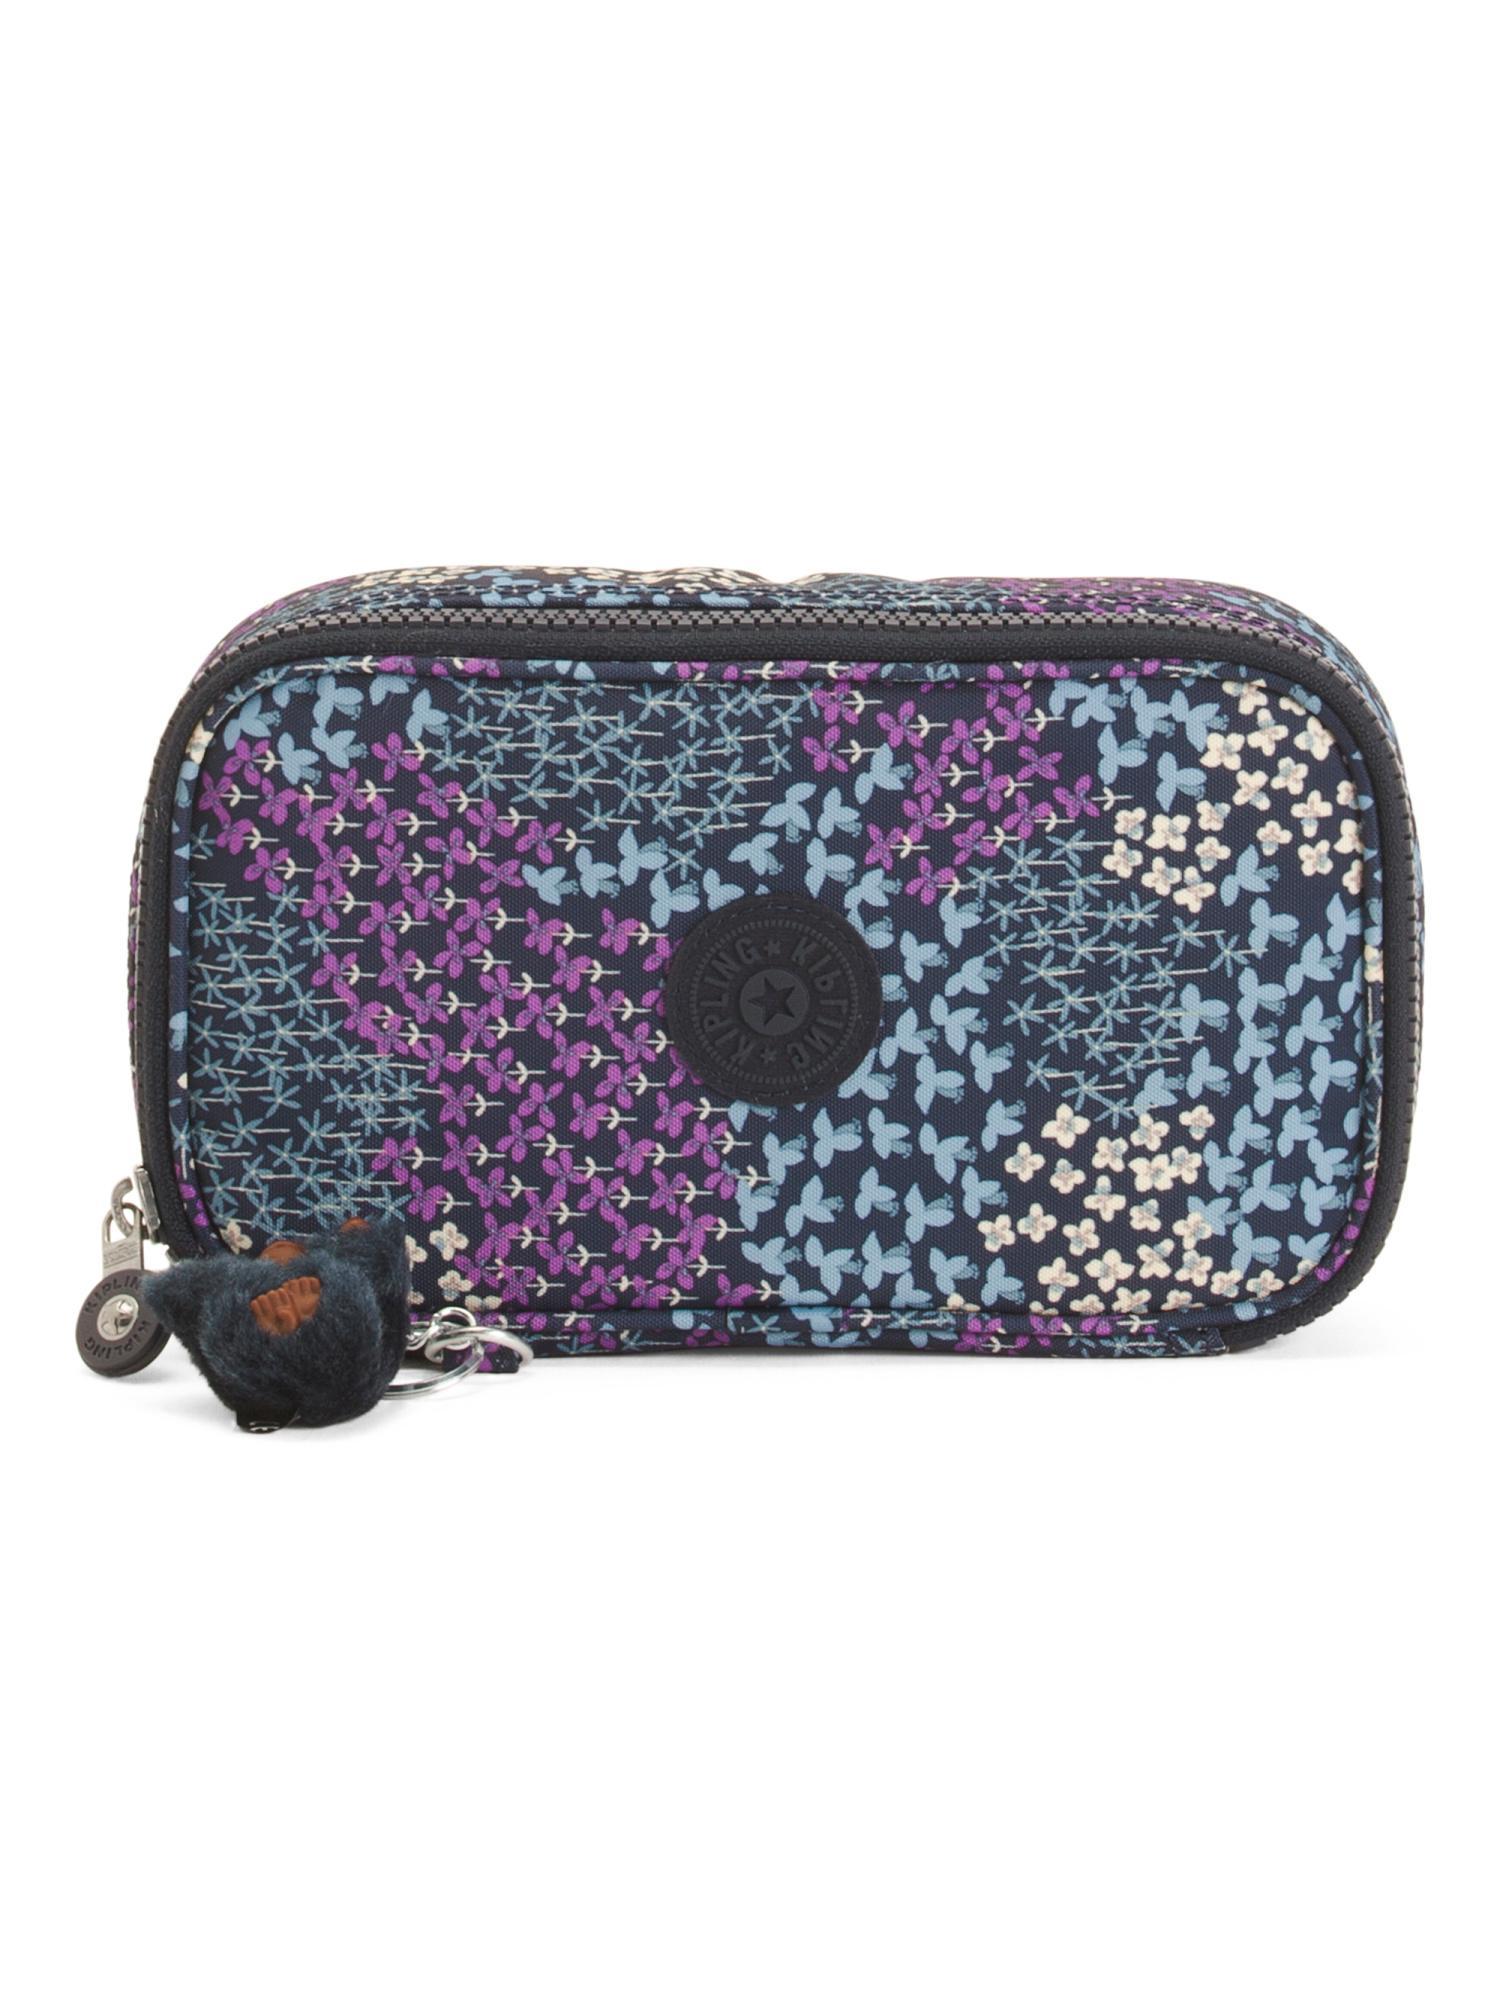 online store d52cf 399c6 Tj Maxx Nylon 50 Pens Multi Function Case in Blue - Lyst